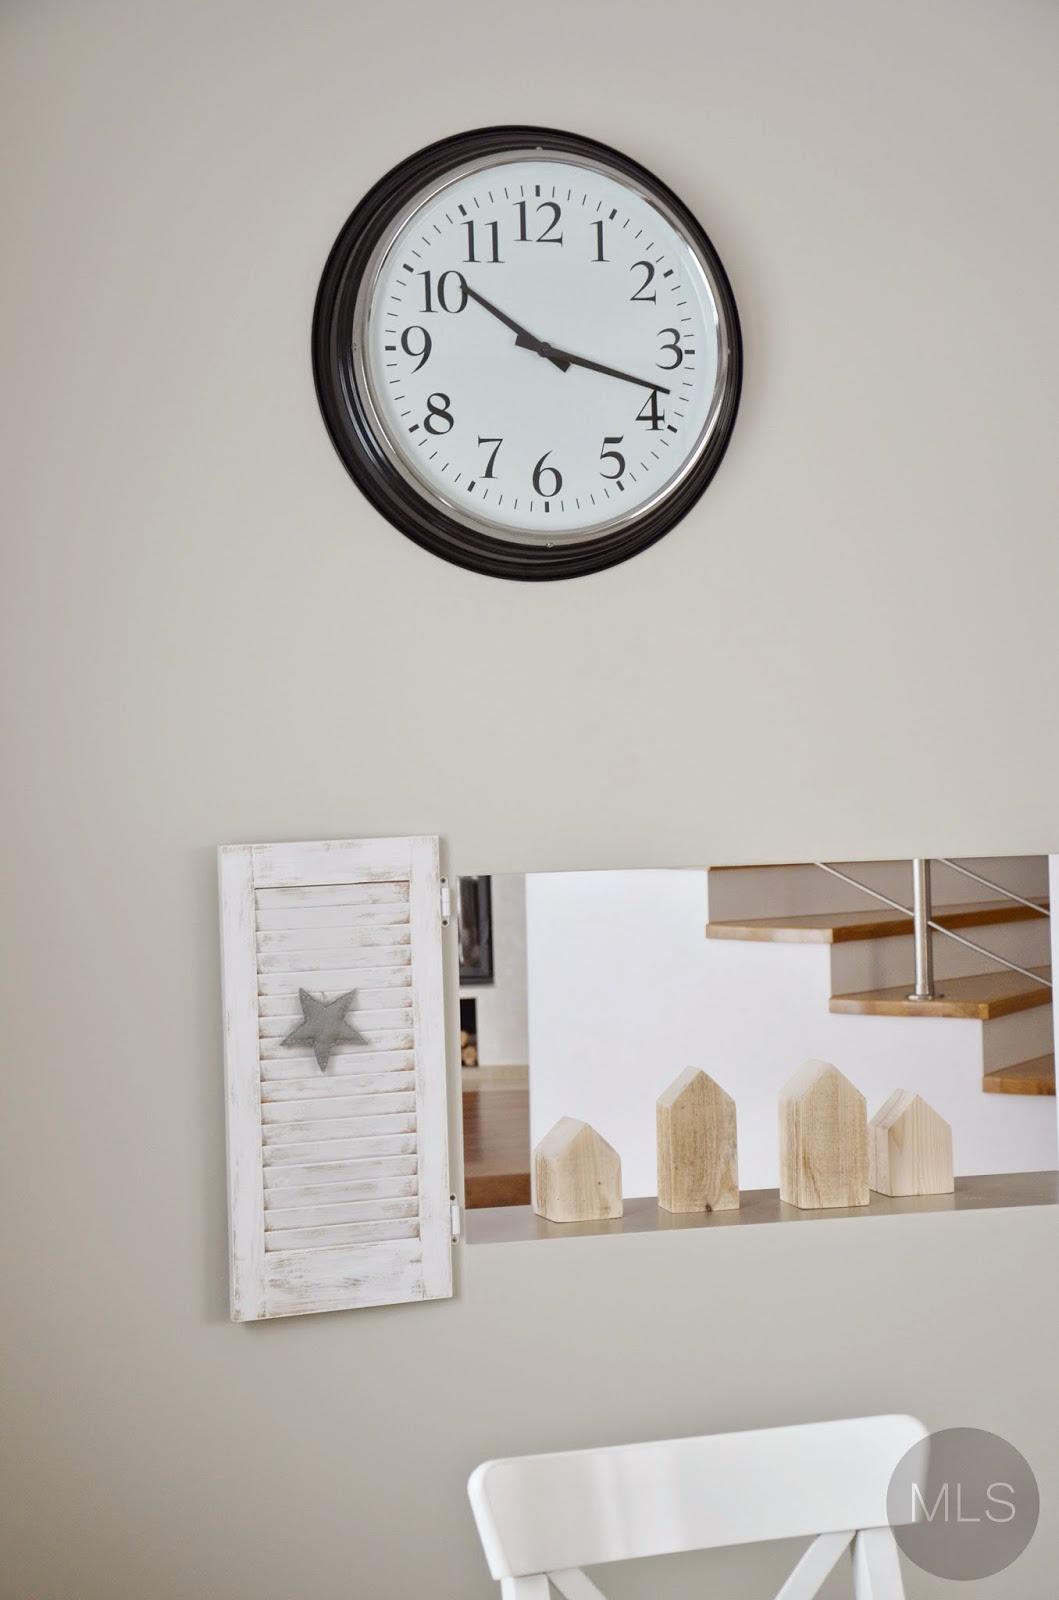 Oversized clock & wooden houses